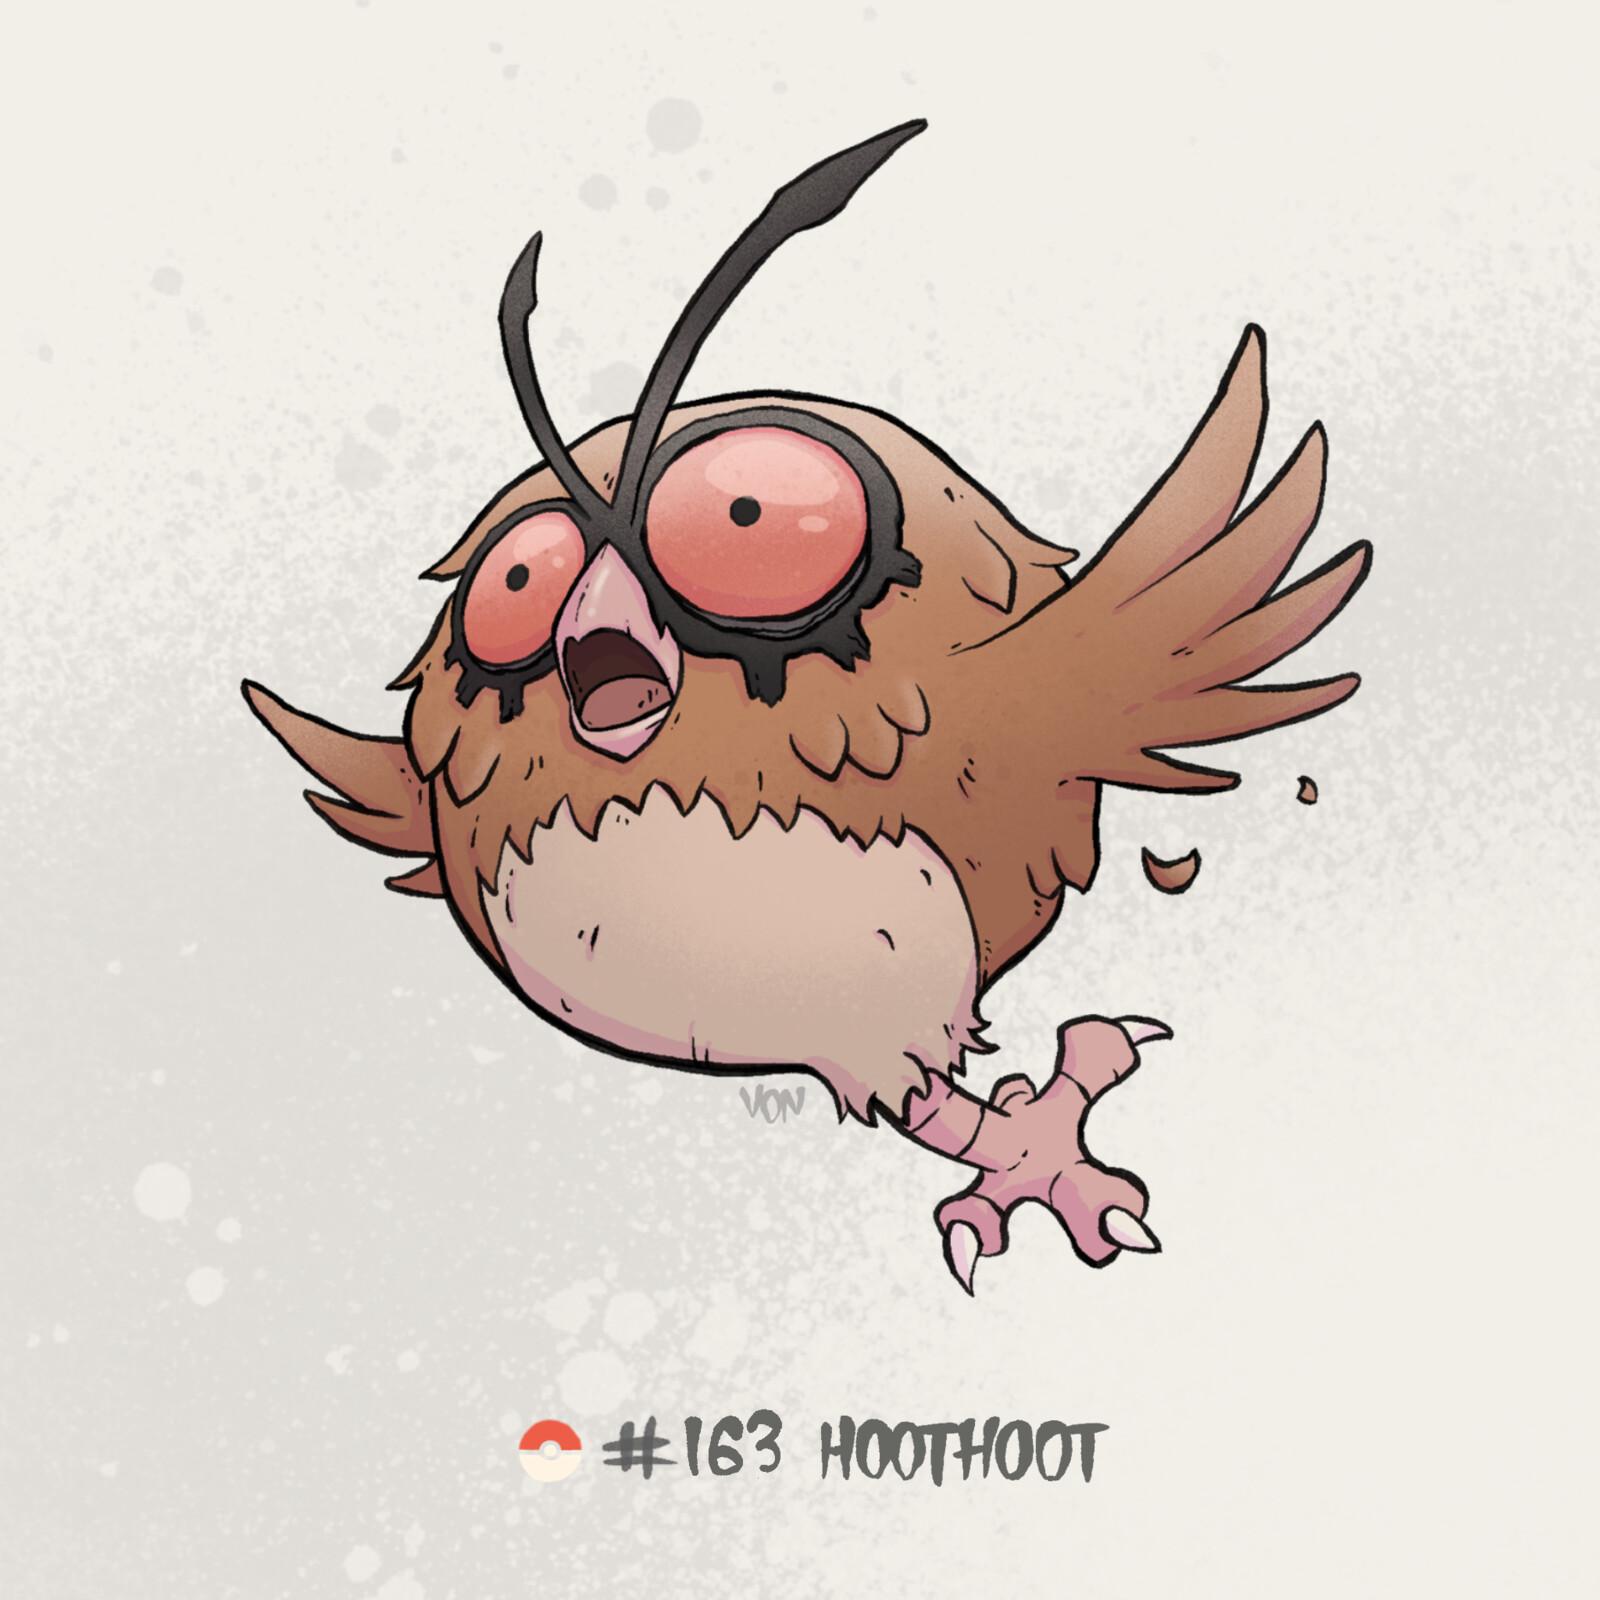 #163 Hoothoot